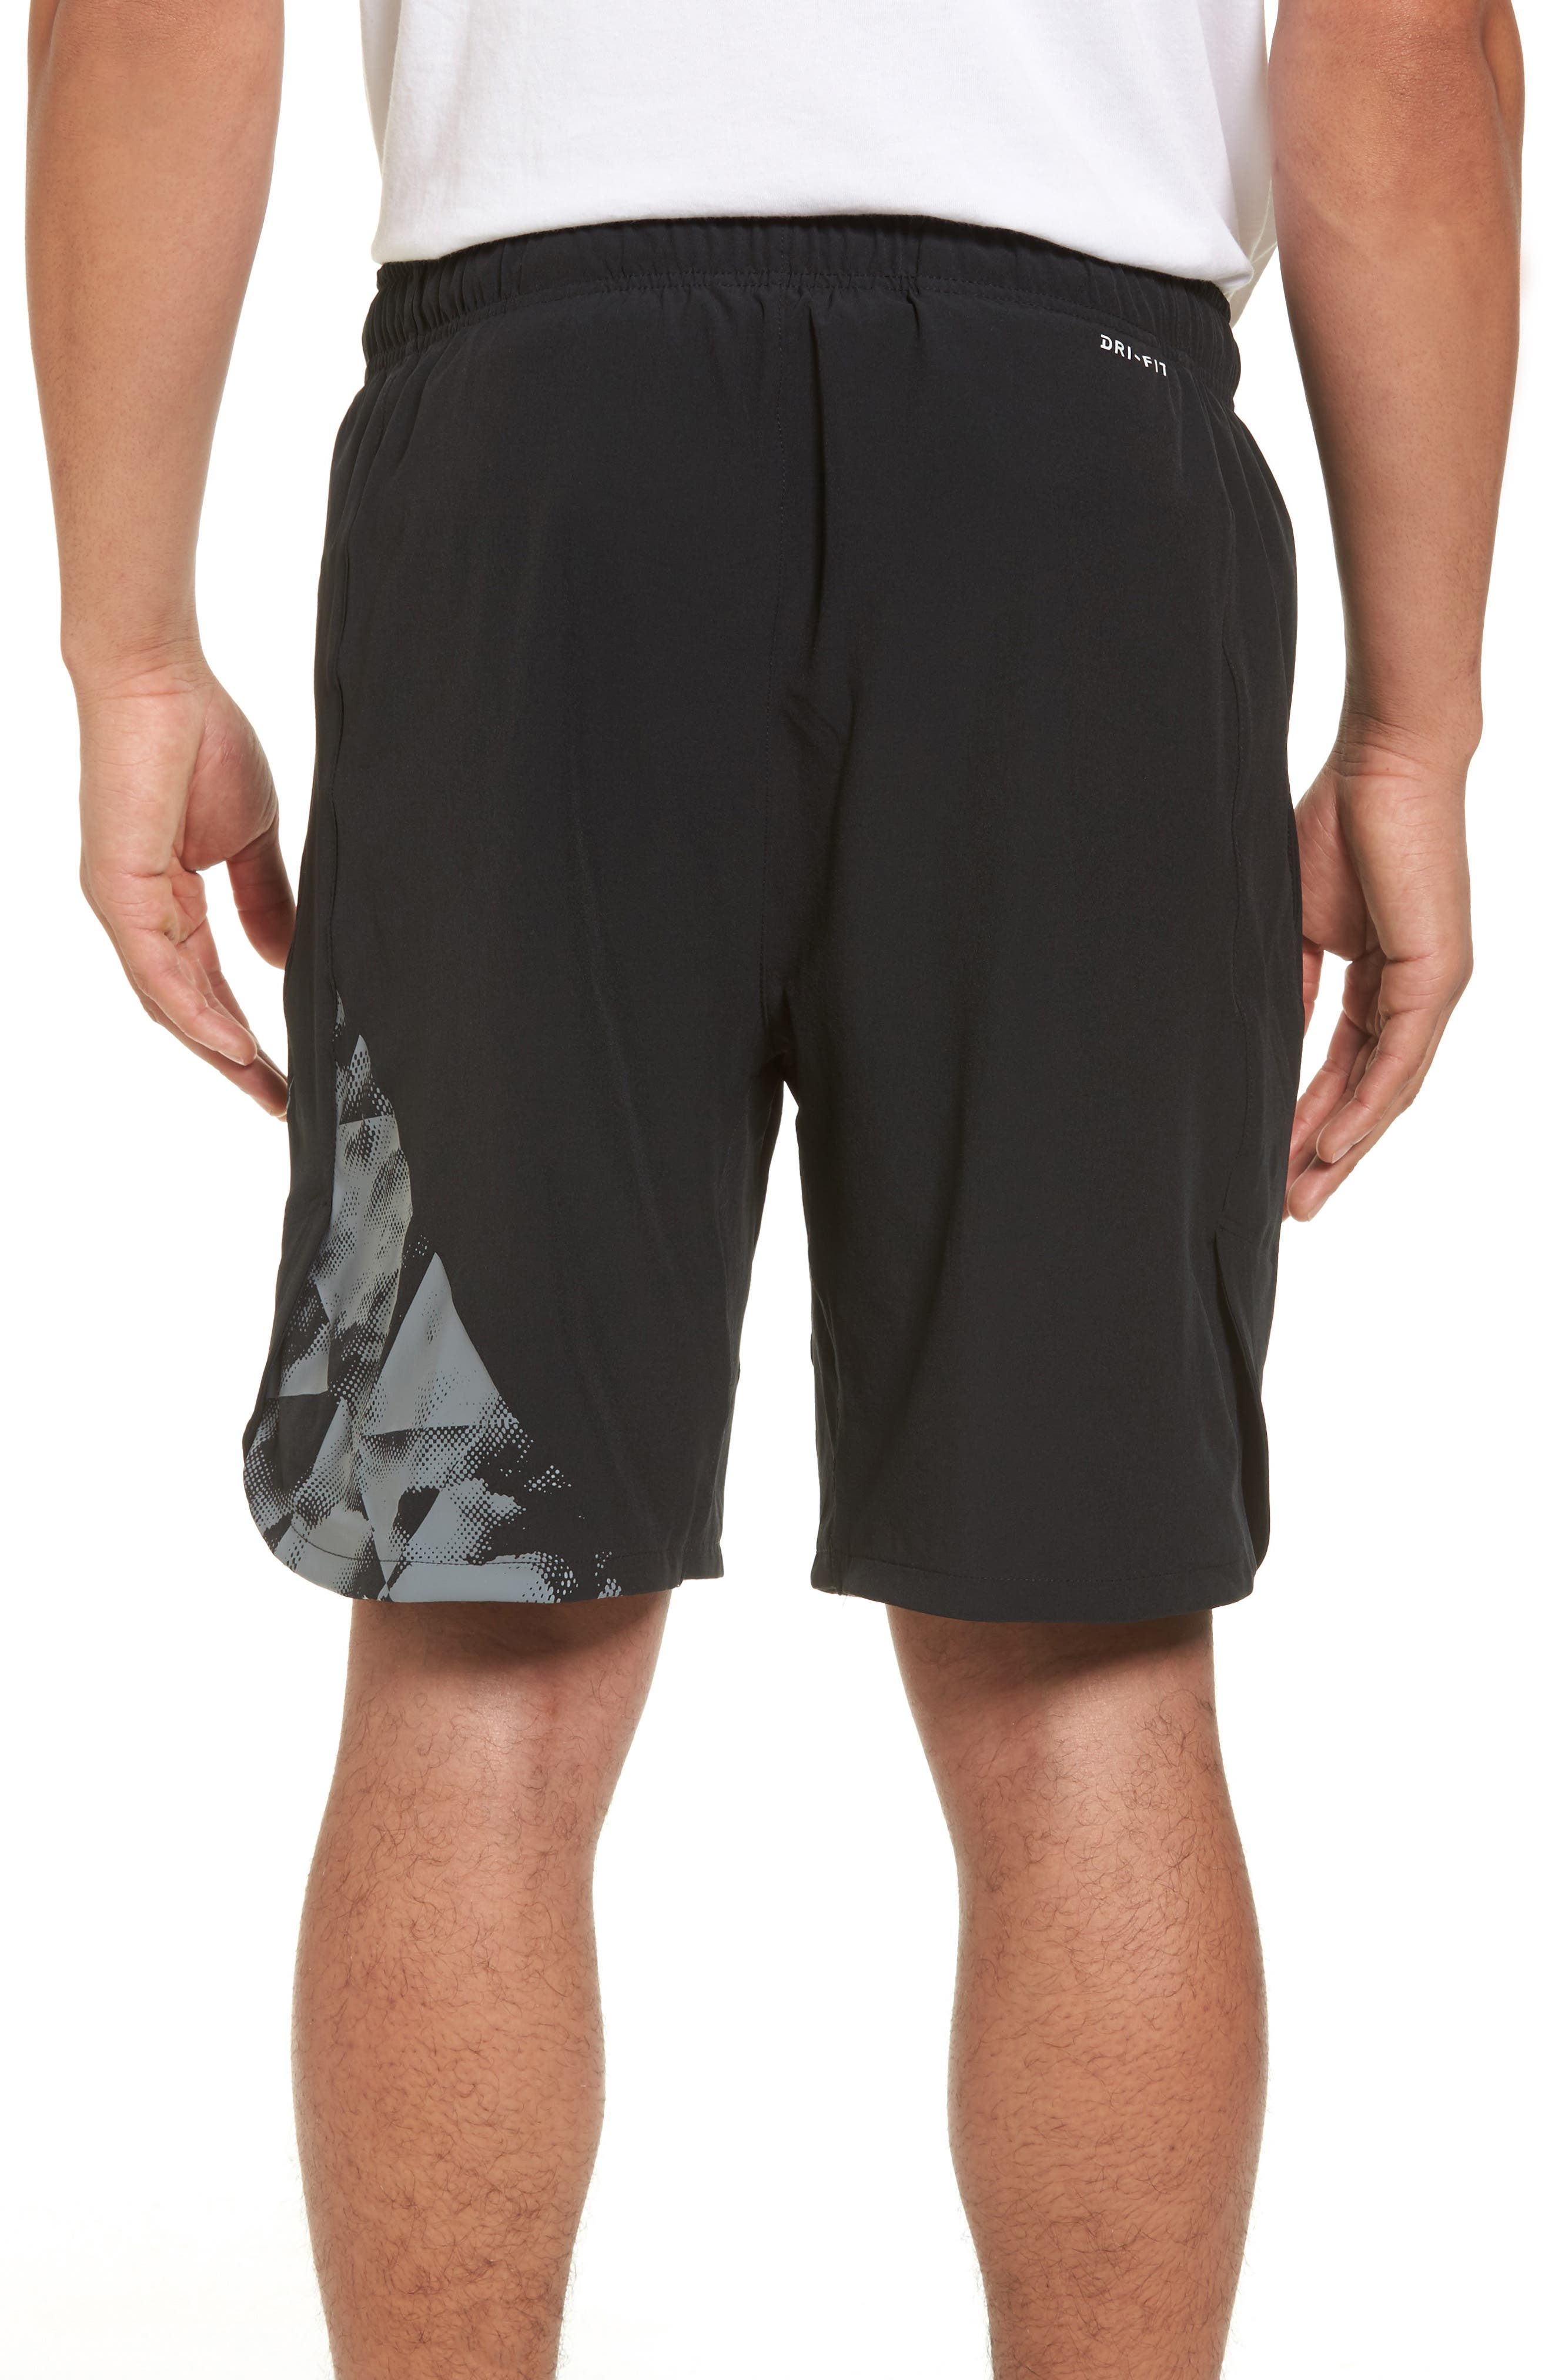 Flex Training Shorts,                             Alternate thumbnail 2, color,                             Black/ Cool Grey